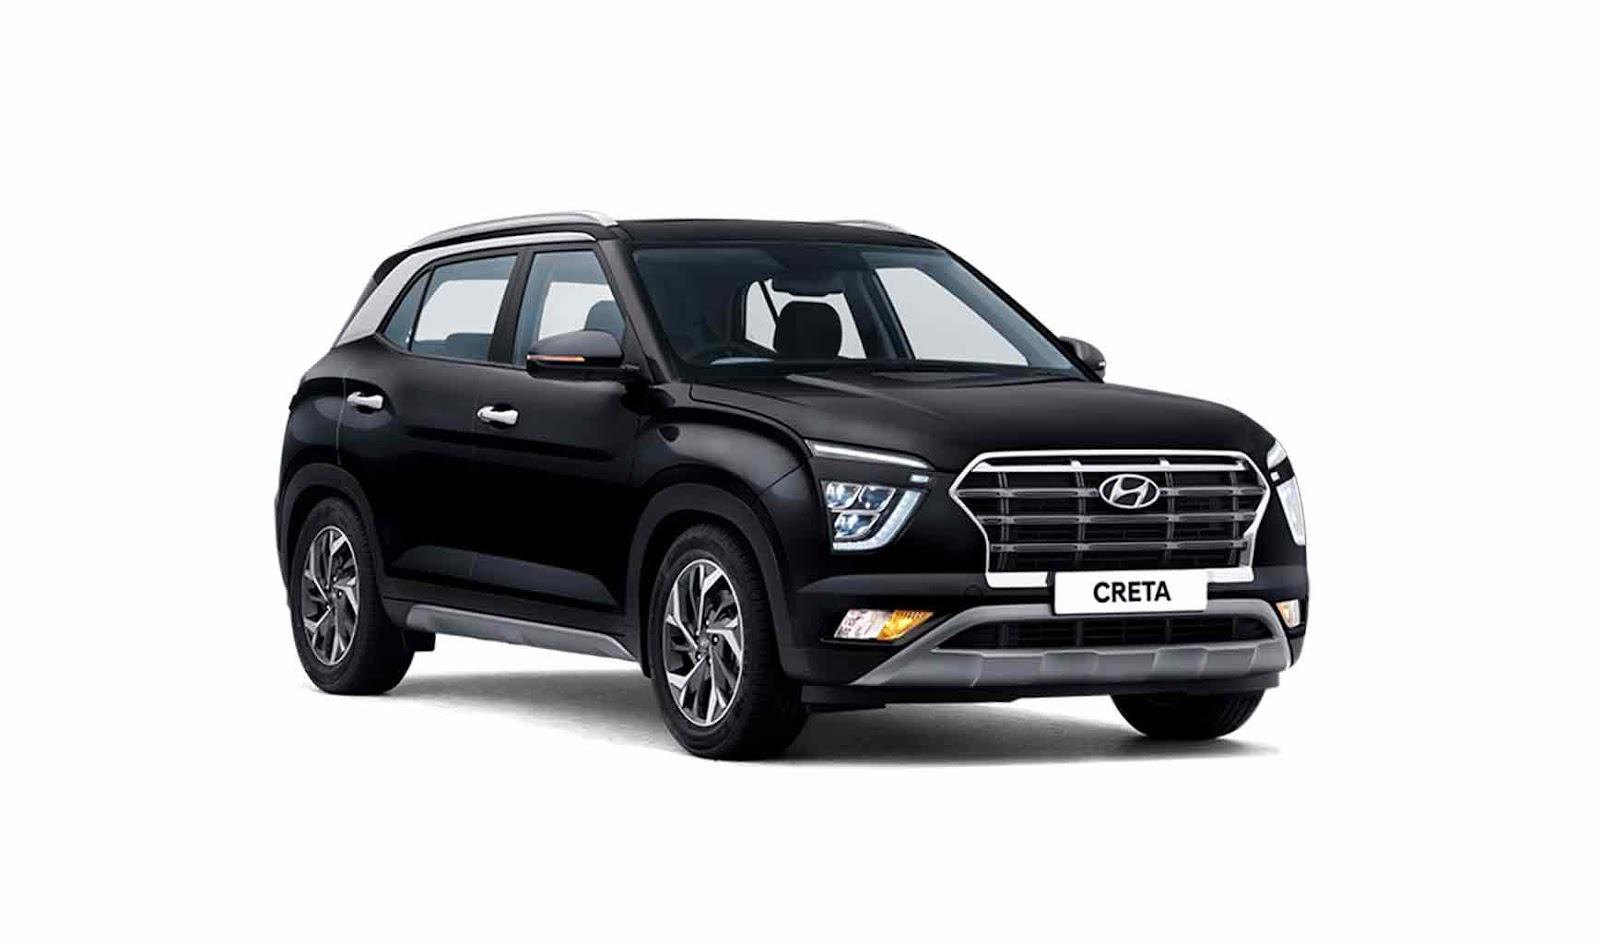 Best Quality Mid-Size SUV in India - Hyundai Creta